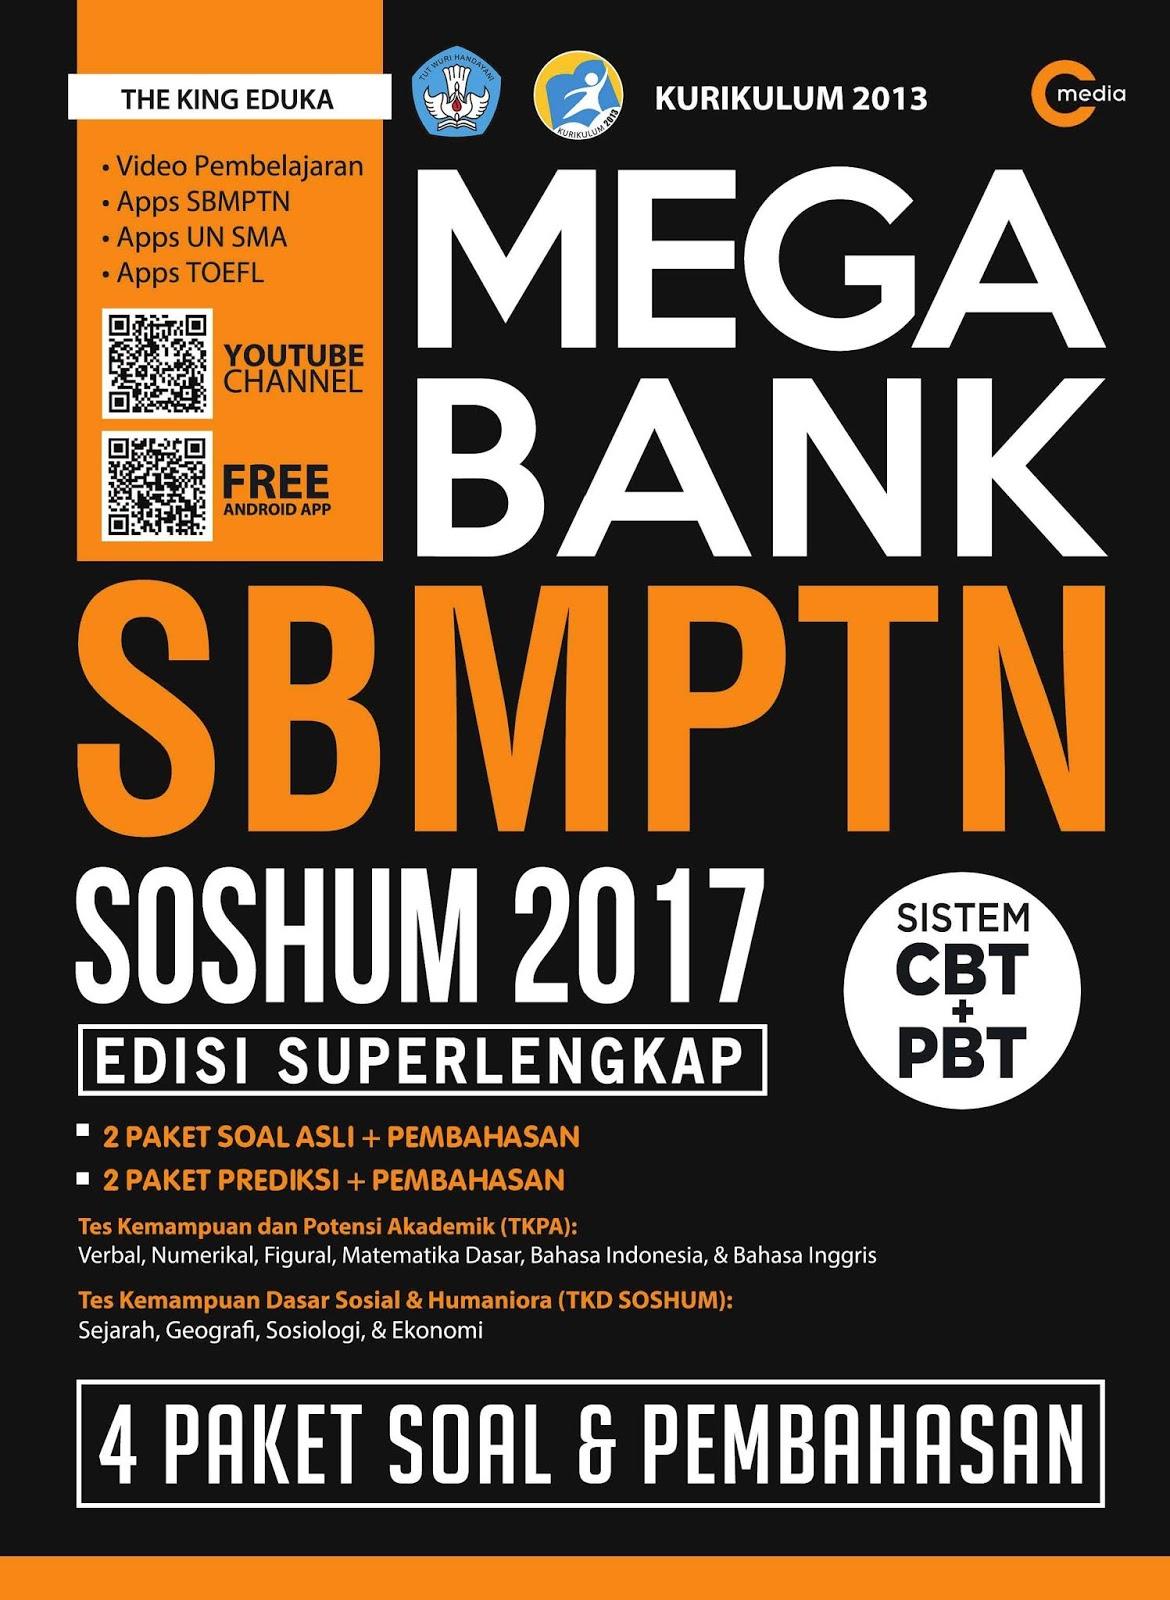 Mega Bank SBMPTN Soshum 2017 (Edisi Super Lengkap)